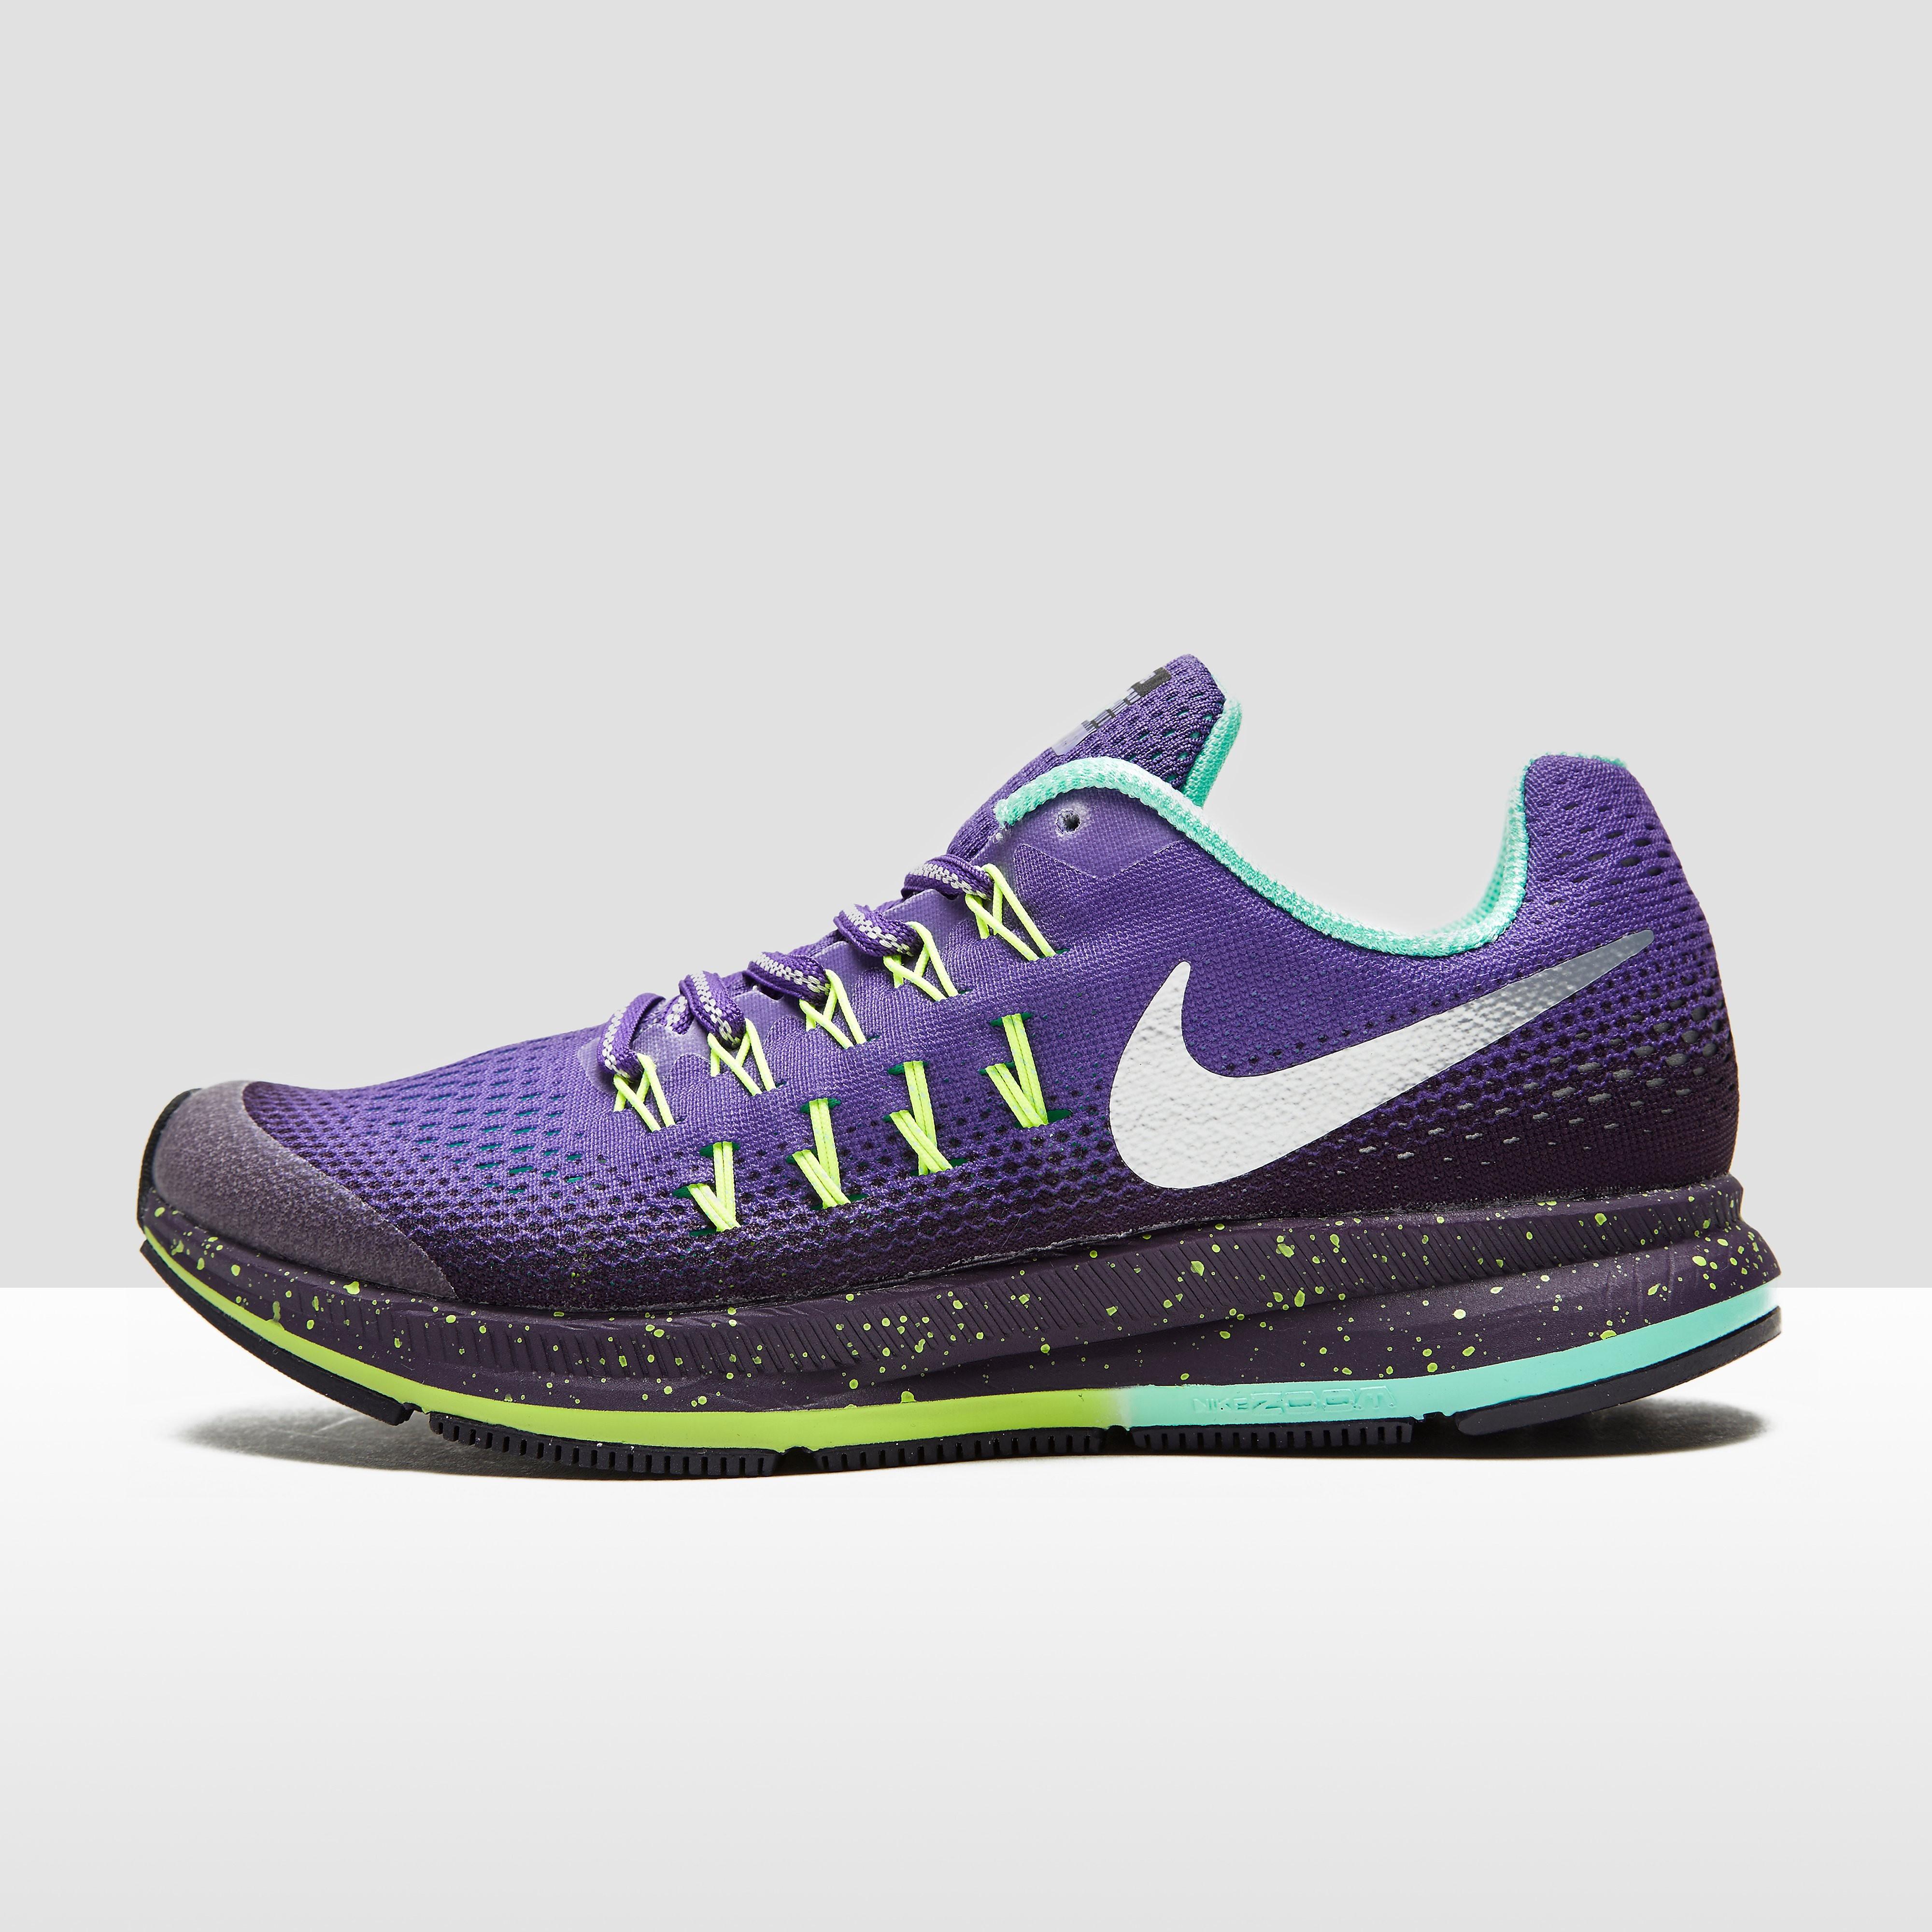 Nike NIKE ZooM PEGASUS 33 Junior Running Shoes